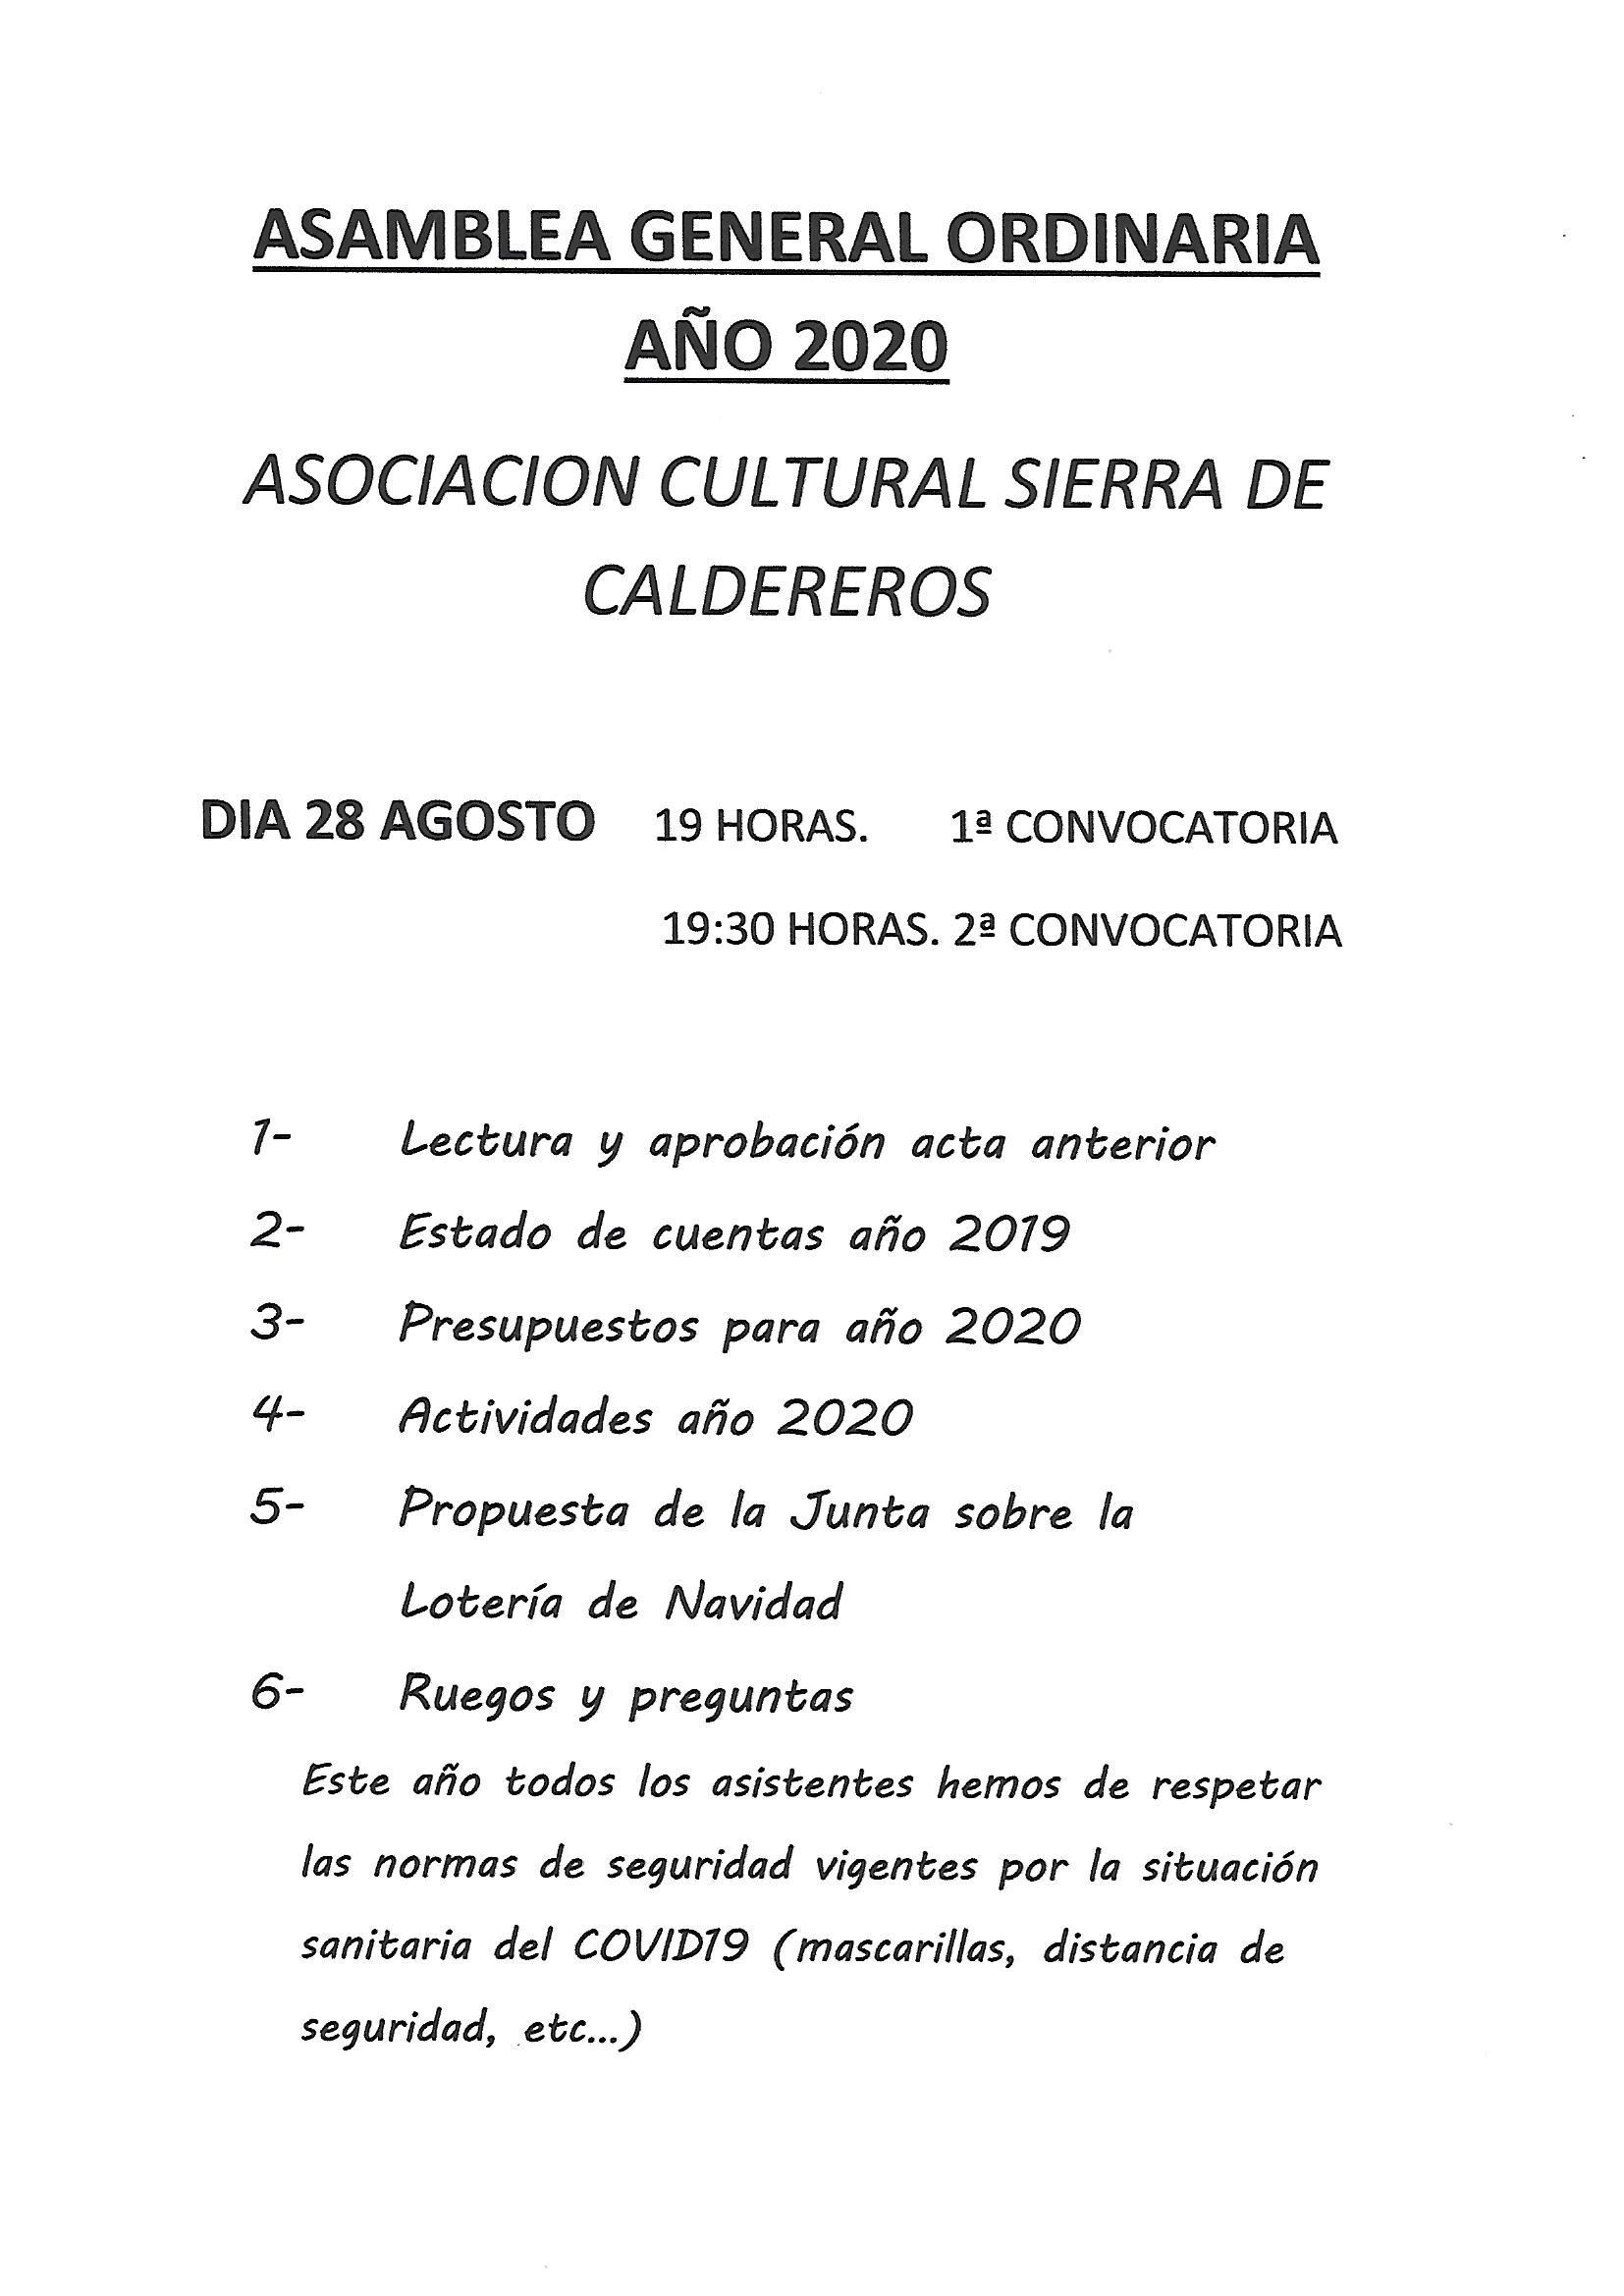 Asamblea General Ordinaria Año 2020